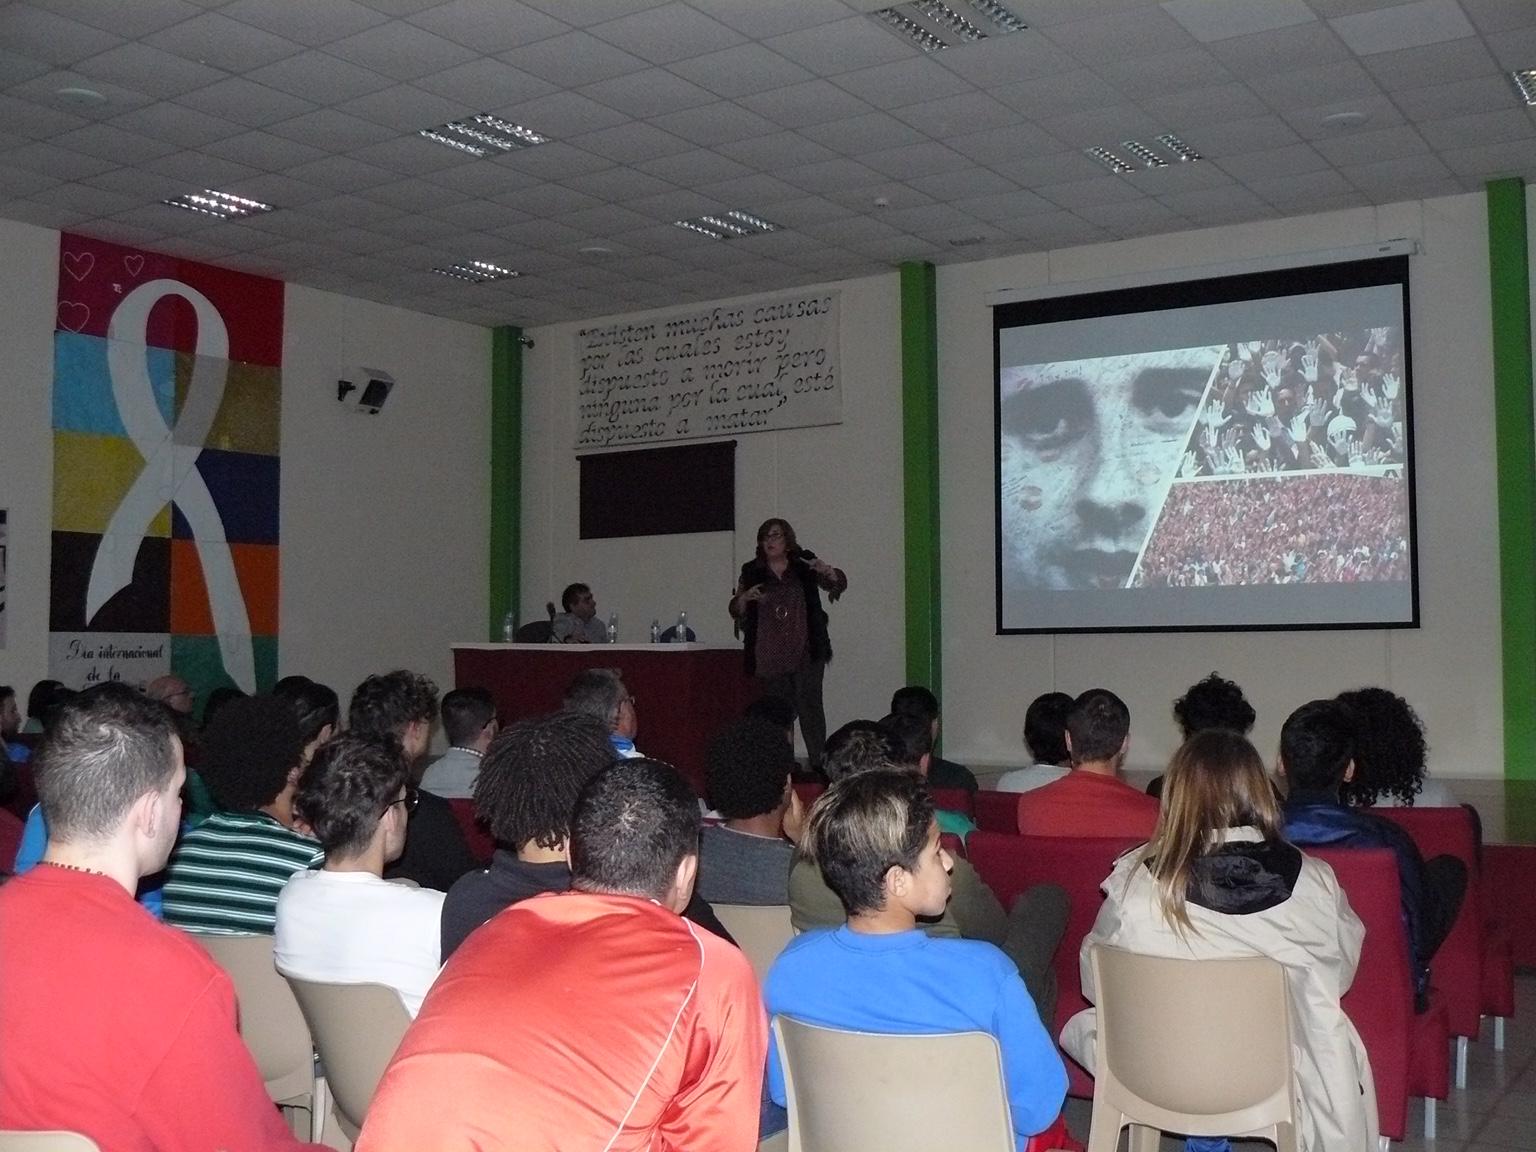 Cristina Cuesta, directora de la FMAB, ofreciendo una charla en el centro Teresa de Calcuta.